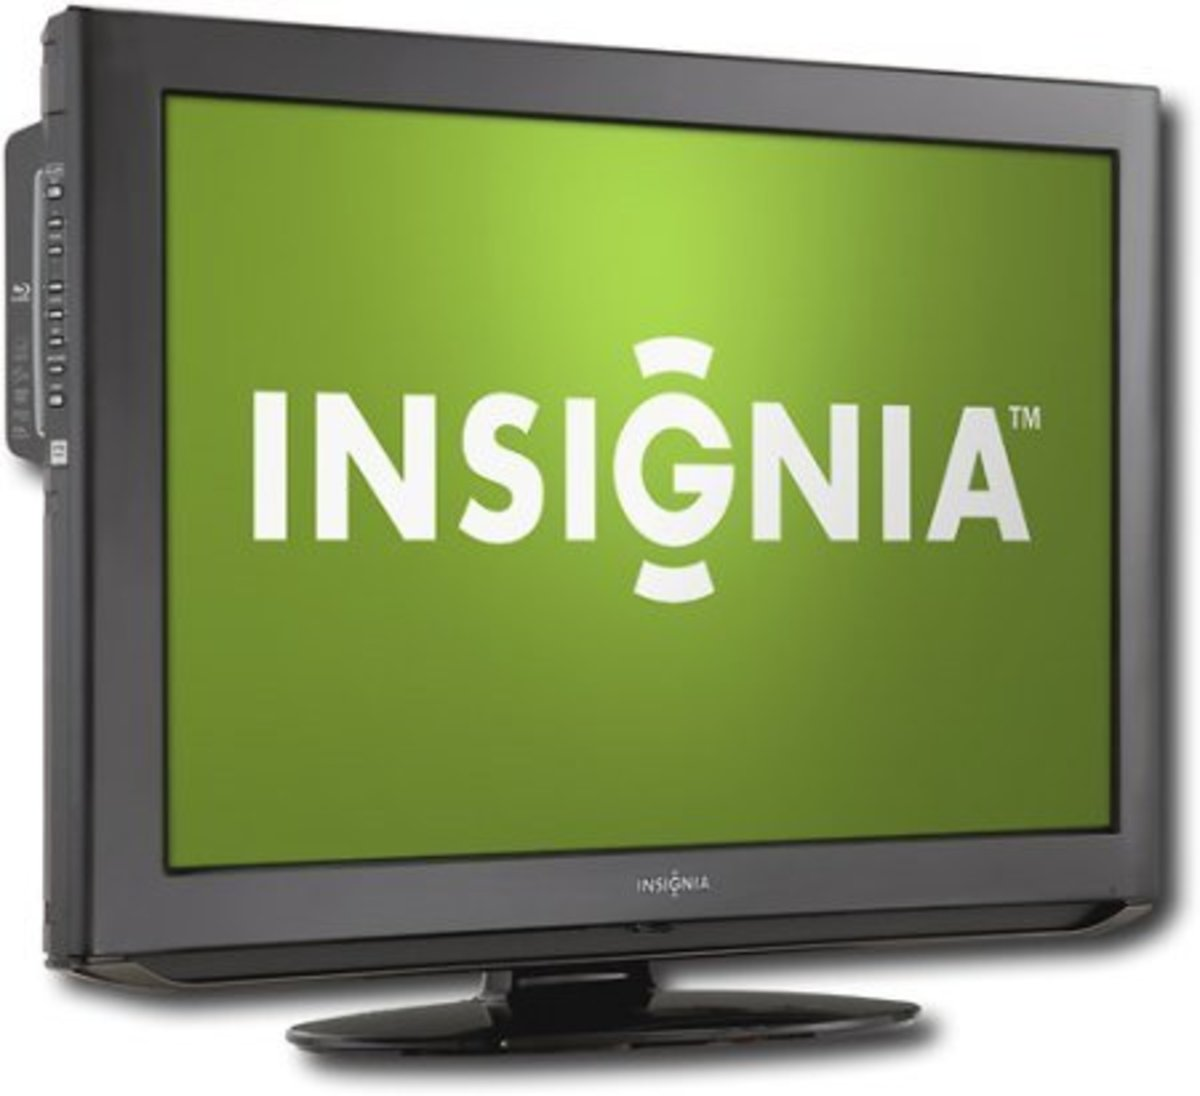 Updating Insignia TV Firmware